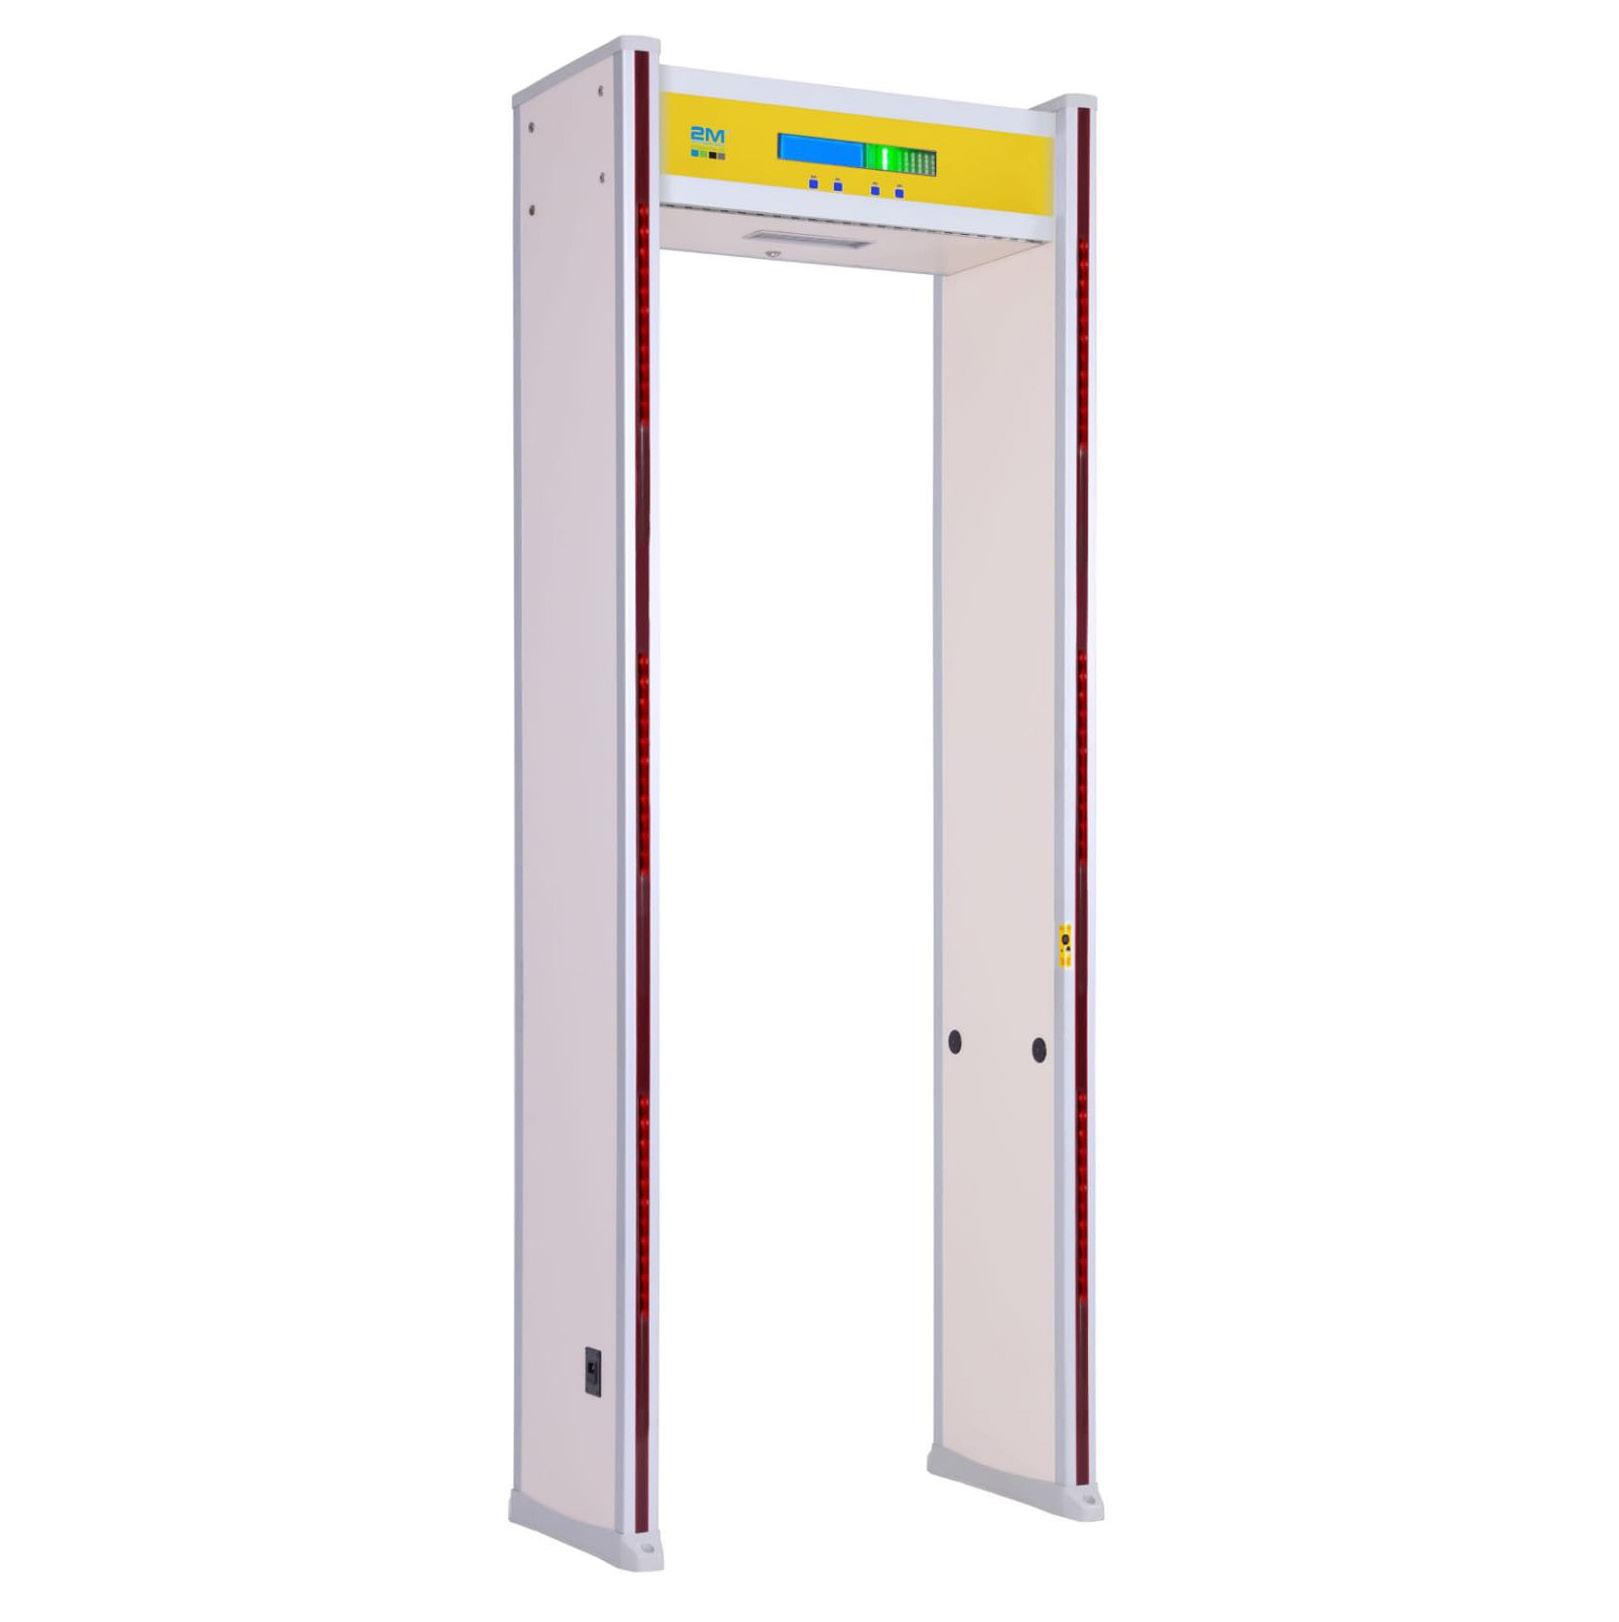 2MTHWT-HMD Human Body Temperature Measurement Metal Security Gate 6 Zones with Single Wrist Thermal Sensor